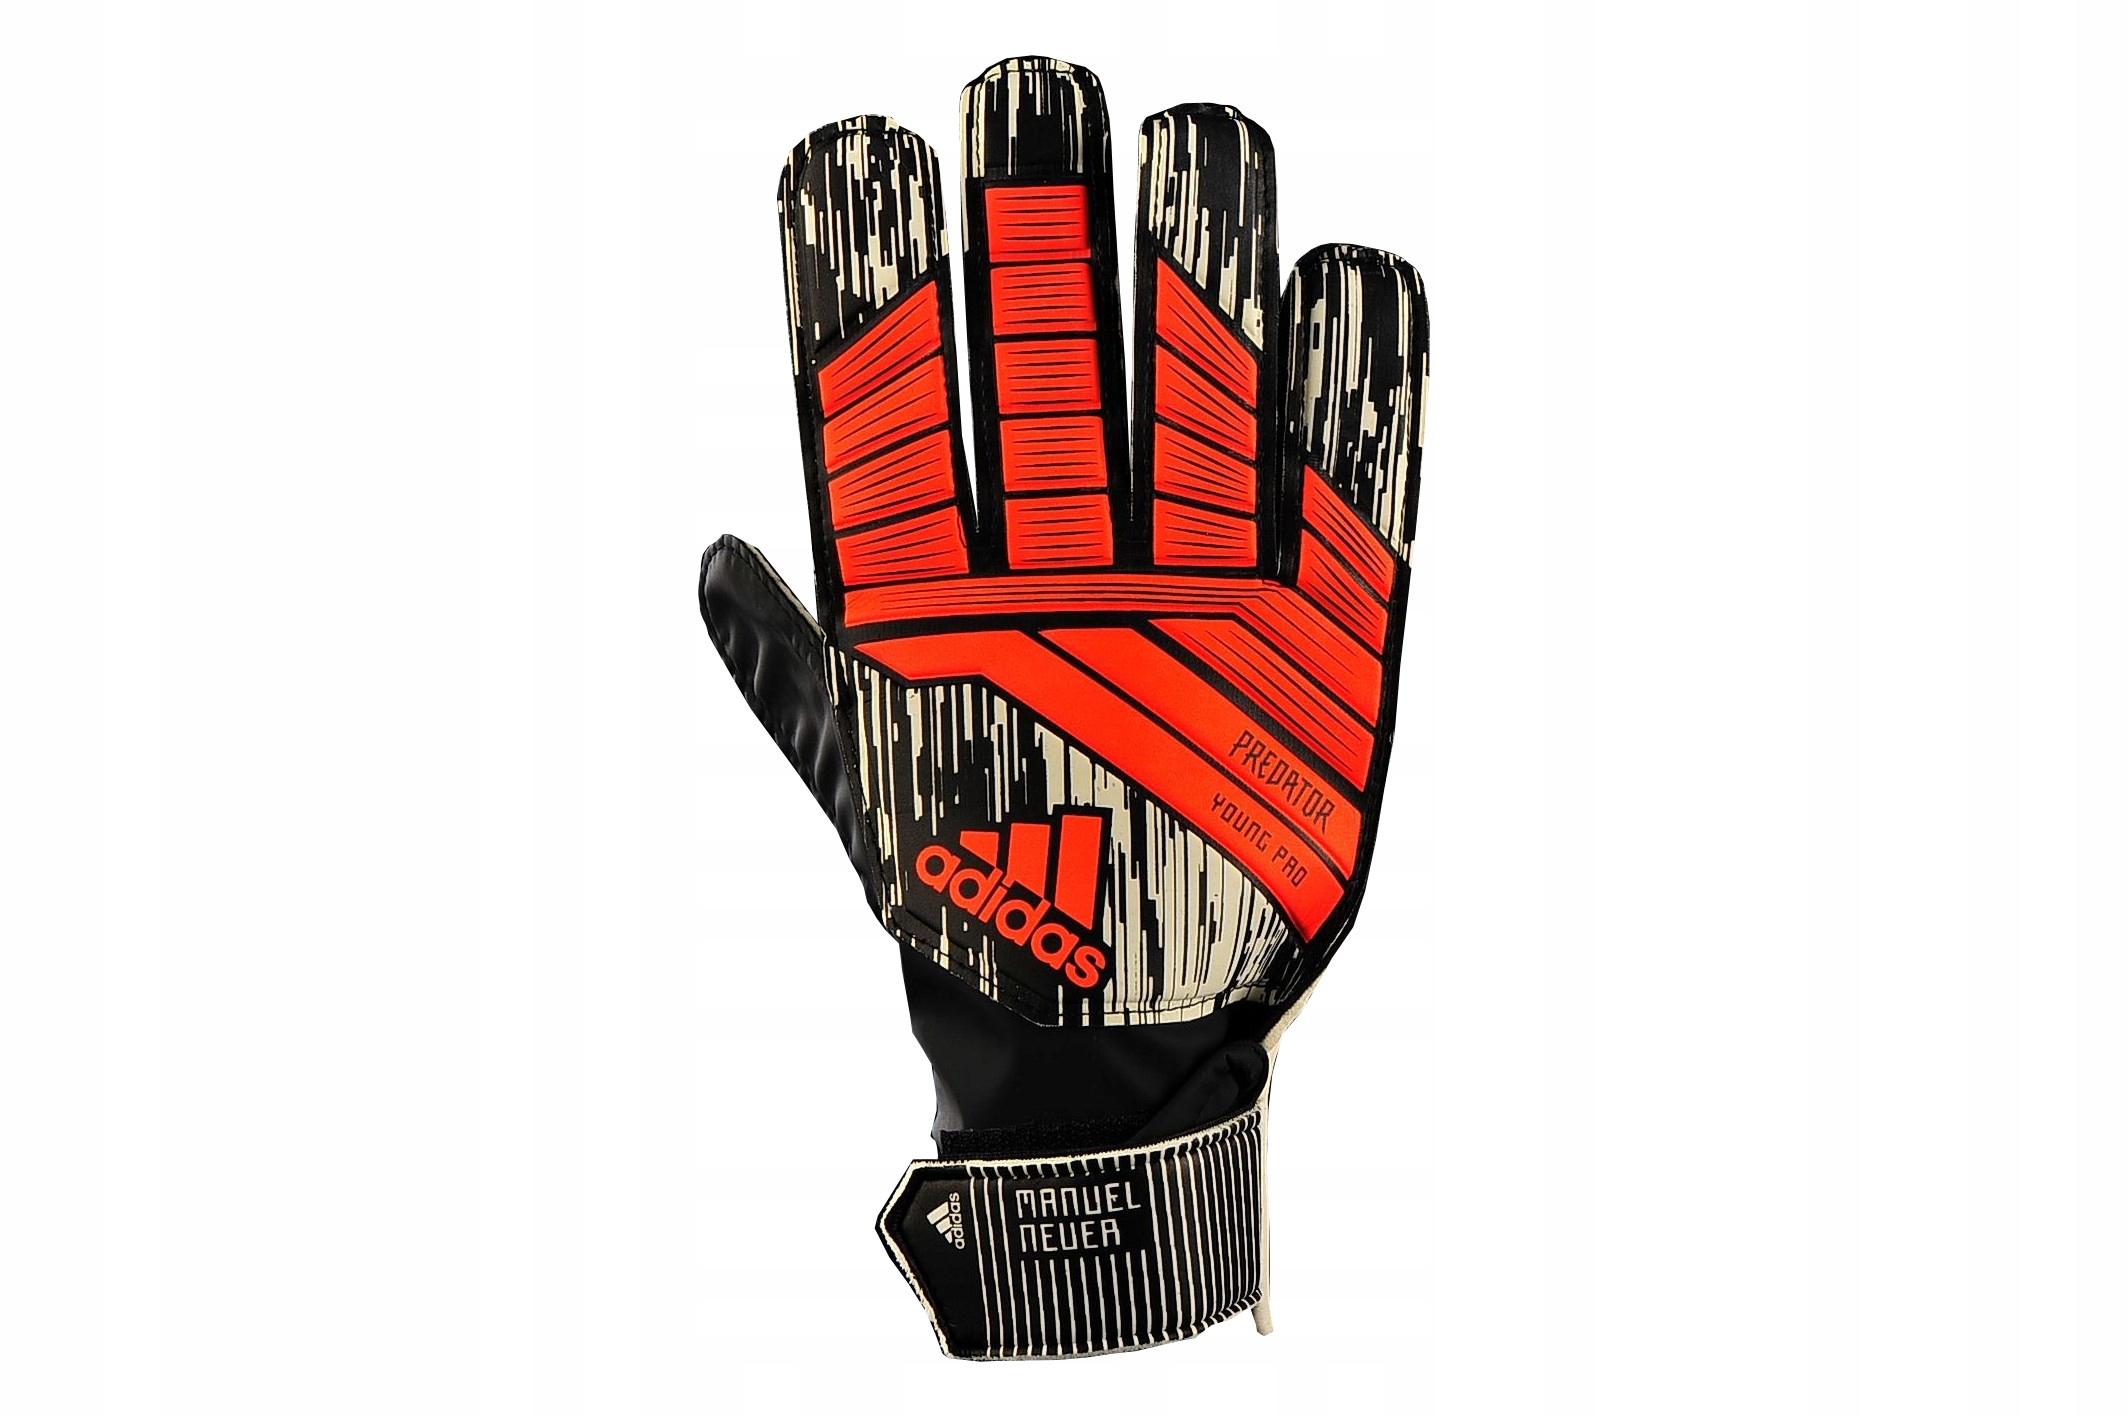 Rękawice bramkarskie Adidas Predator YP Neuer 6